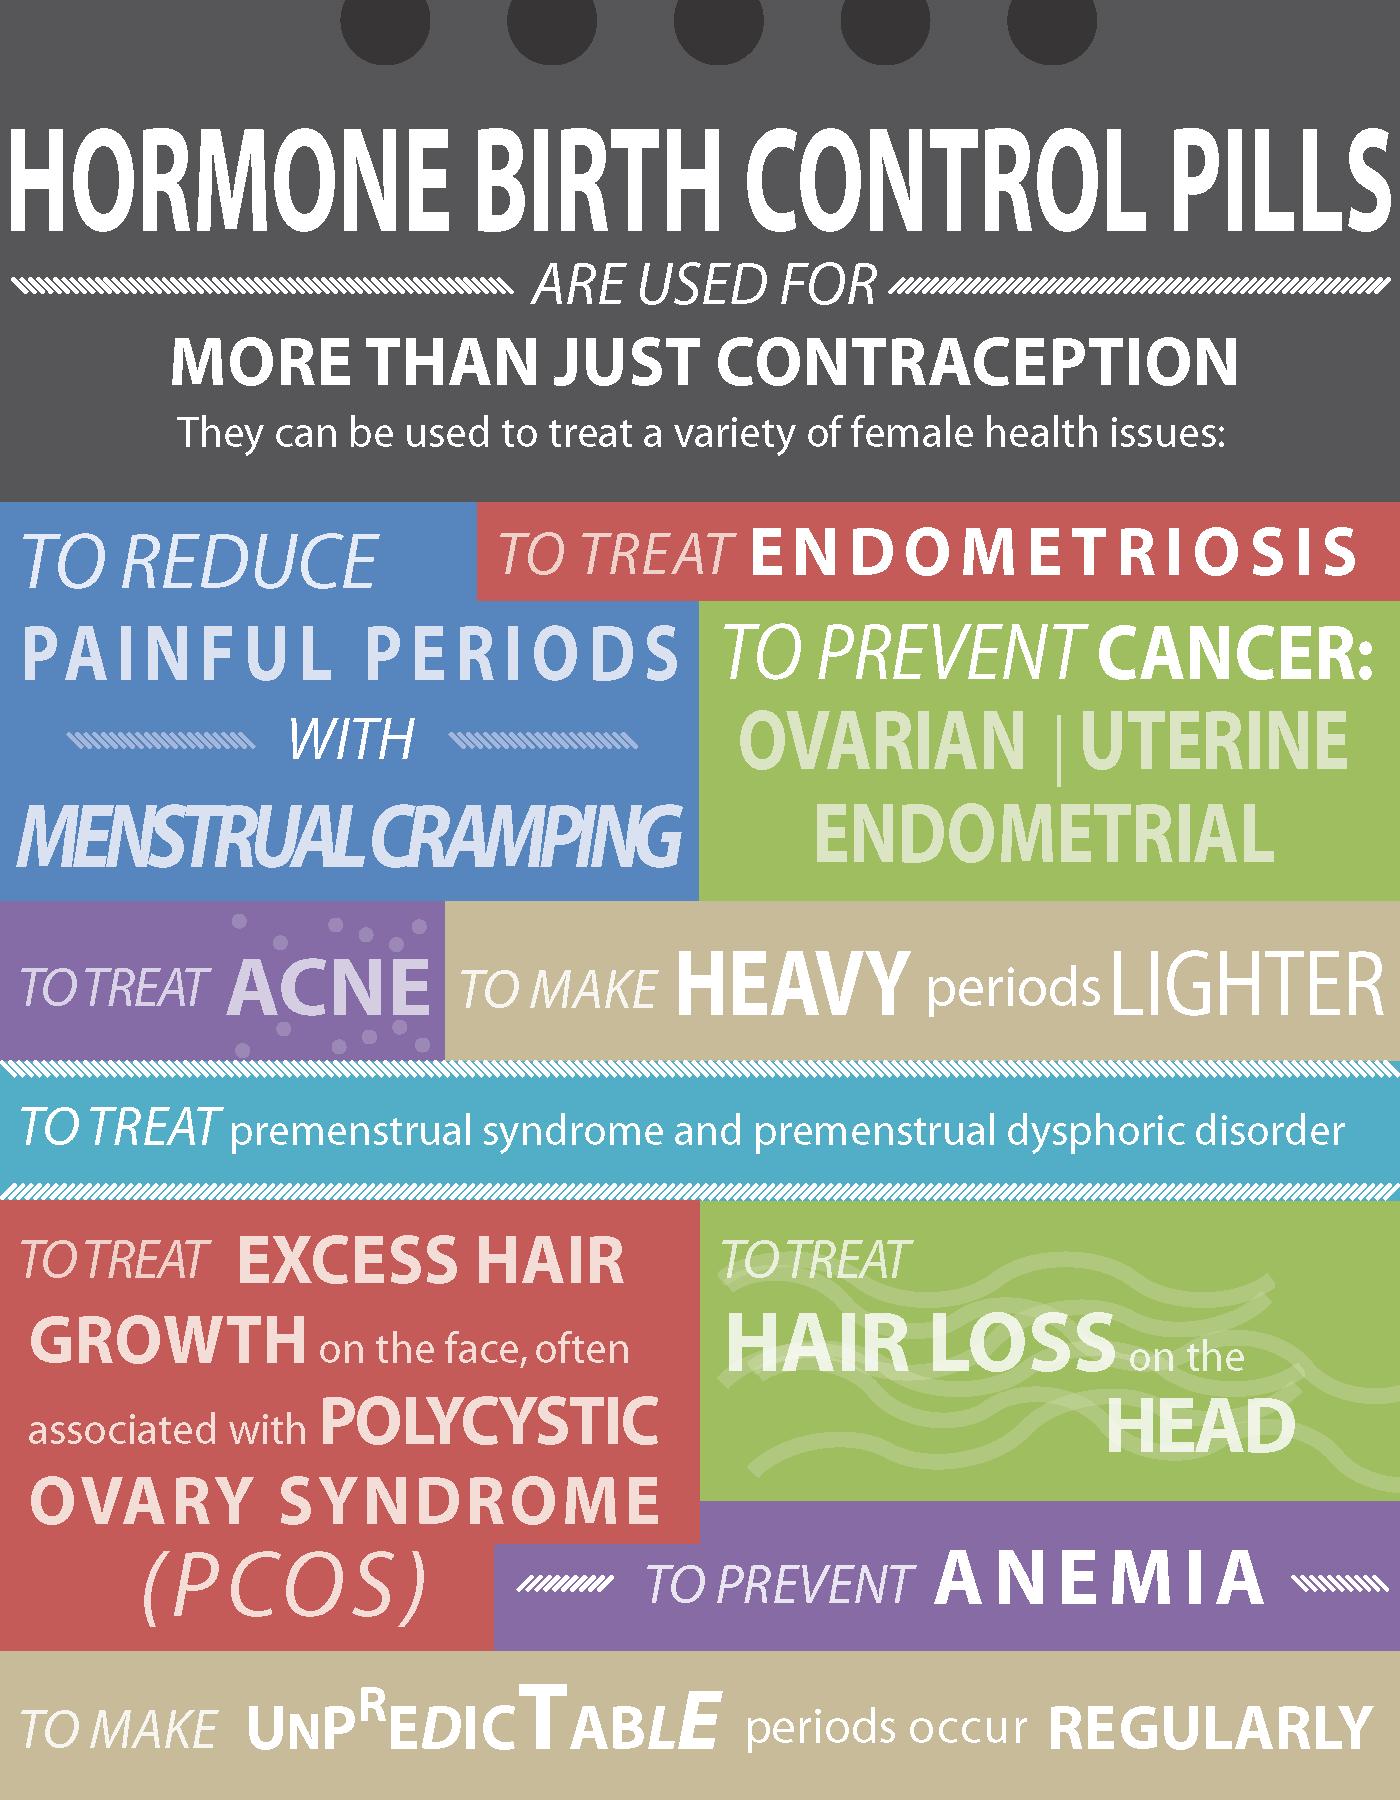 Hormone Birth Control Pills